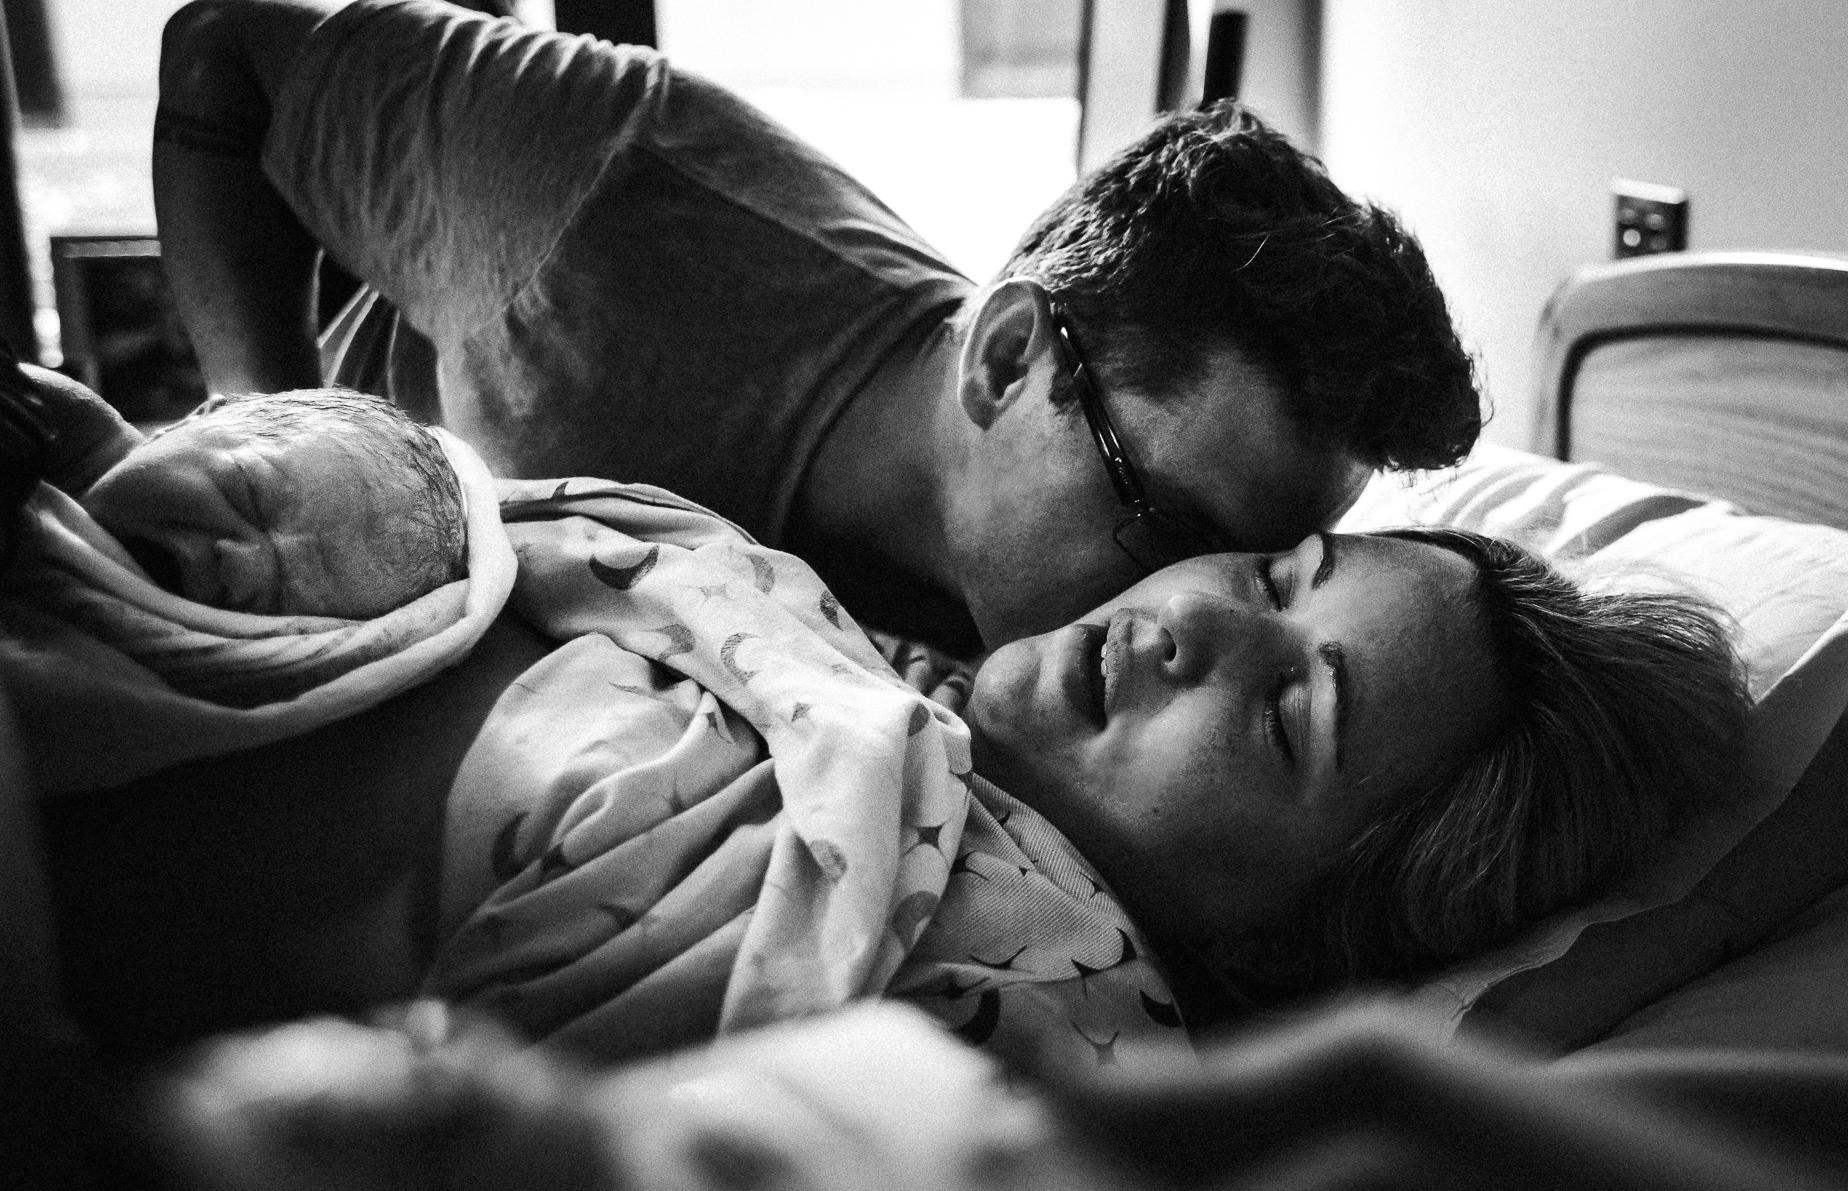 west-boca-hospital-gentle-c-section-epidural-vbac-home-birth-mary-harris-palms-birth-house-center-13.jpg